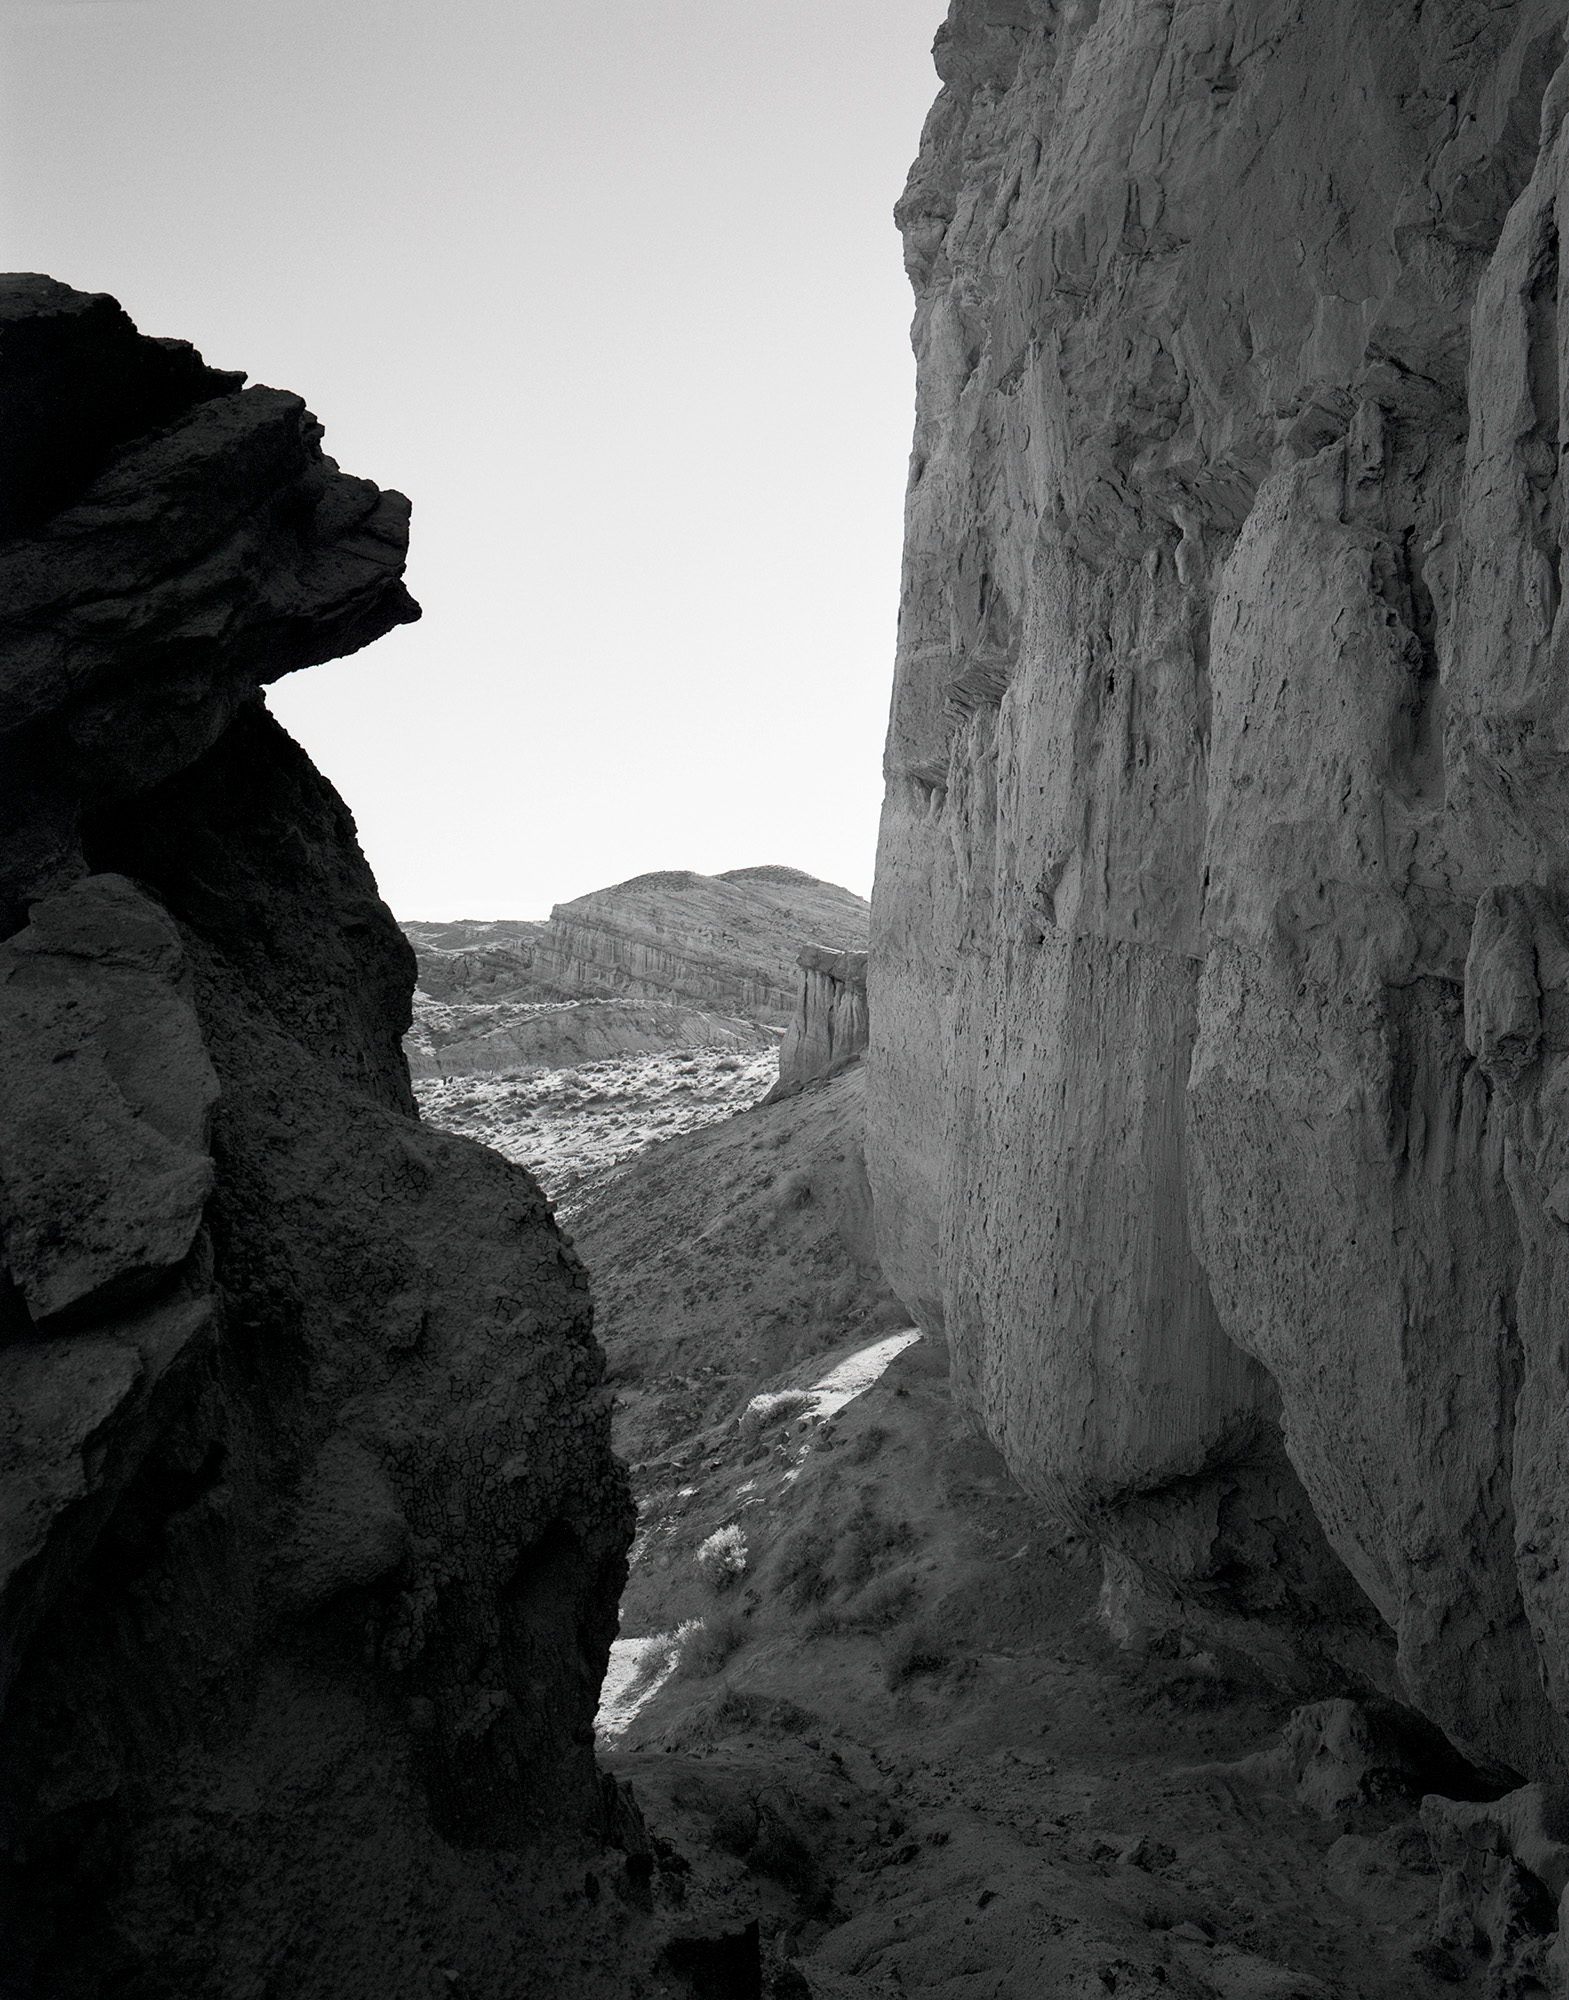 Deborah_Farnault_Red_Rocks_05.jpg